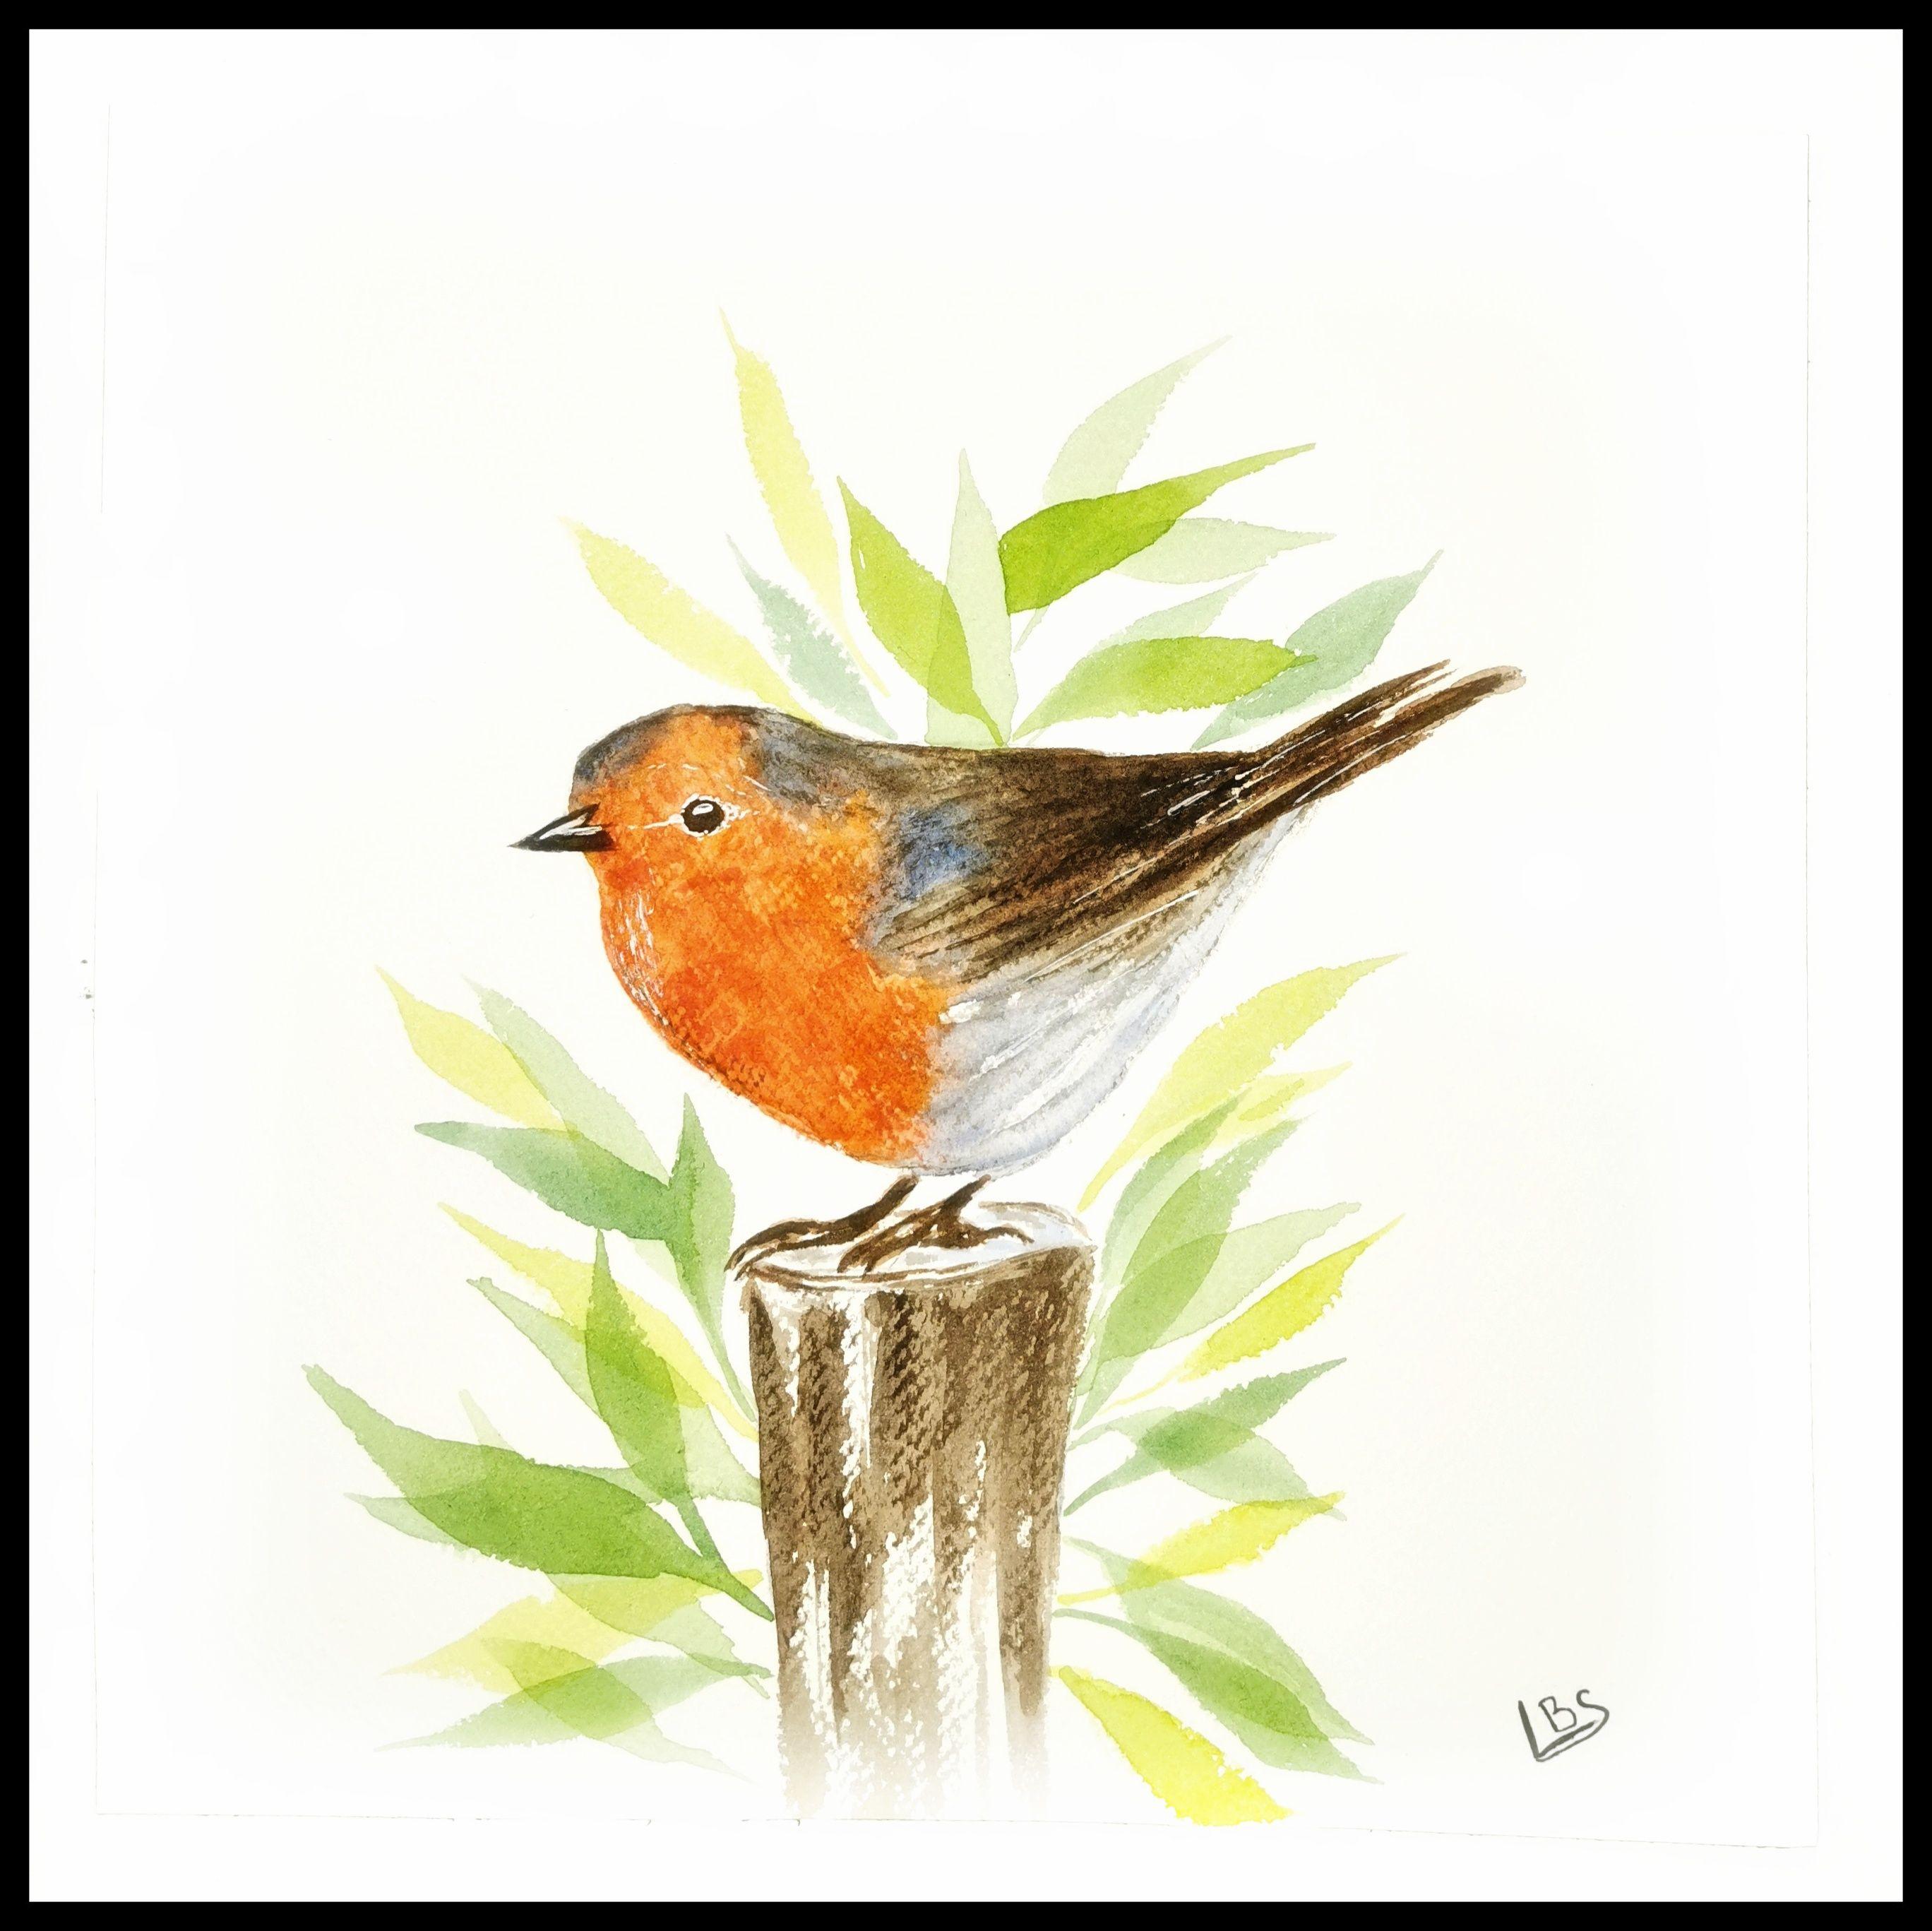 Oiseau Rouge Gorge A L Aquarelle Aquarelle Facile Art A Theme Oiseau Peinture Sur Toile Facile